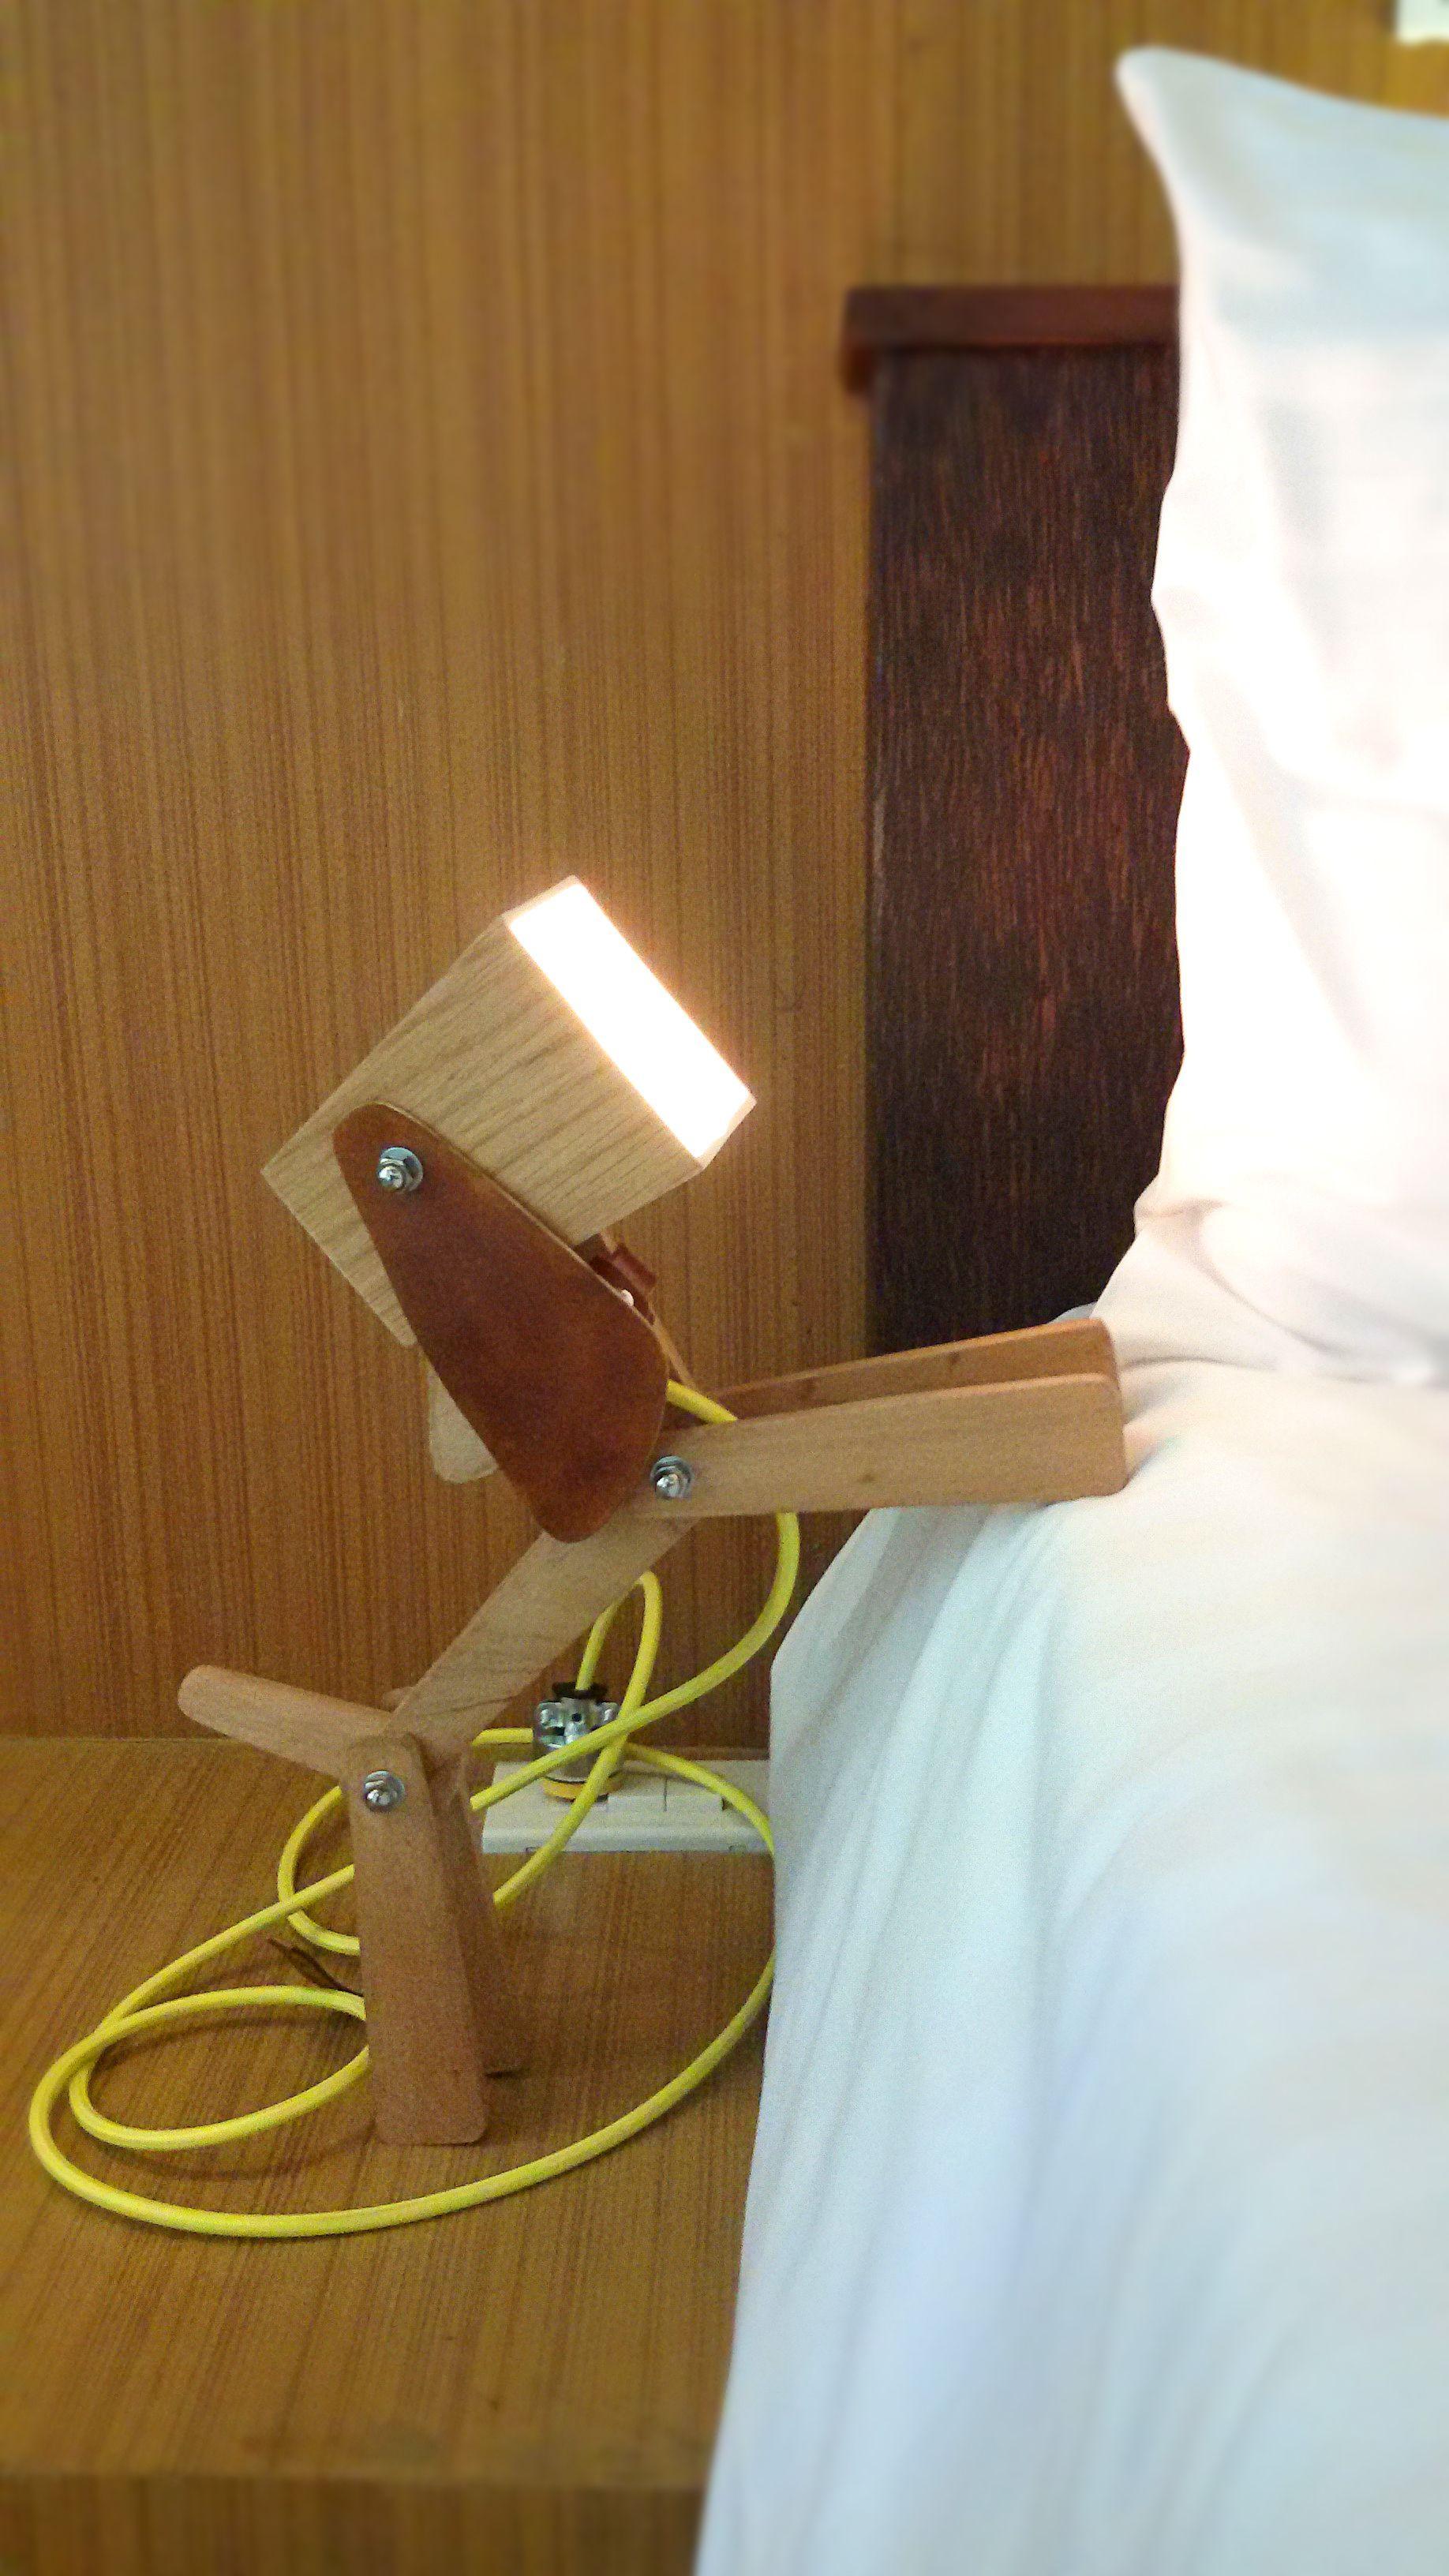 Dog Lamp Beagle Lamp Light Beagle Dog Table Lamps Lamps